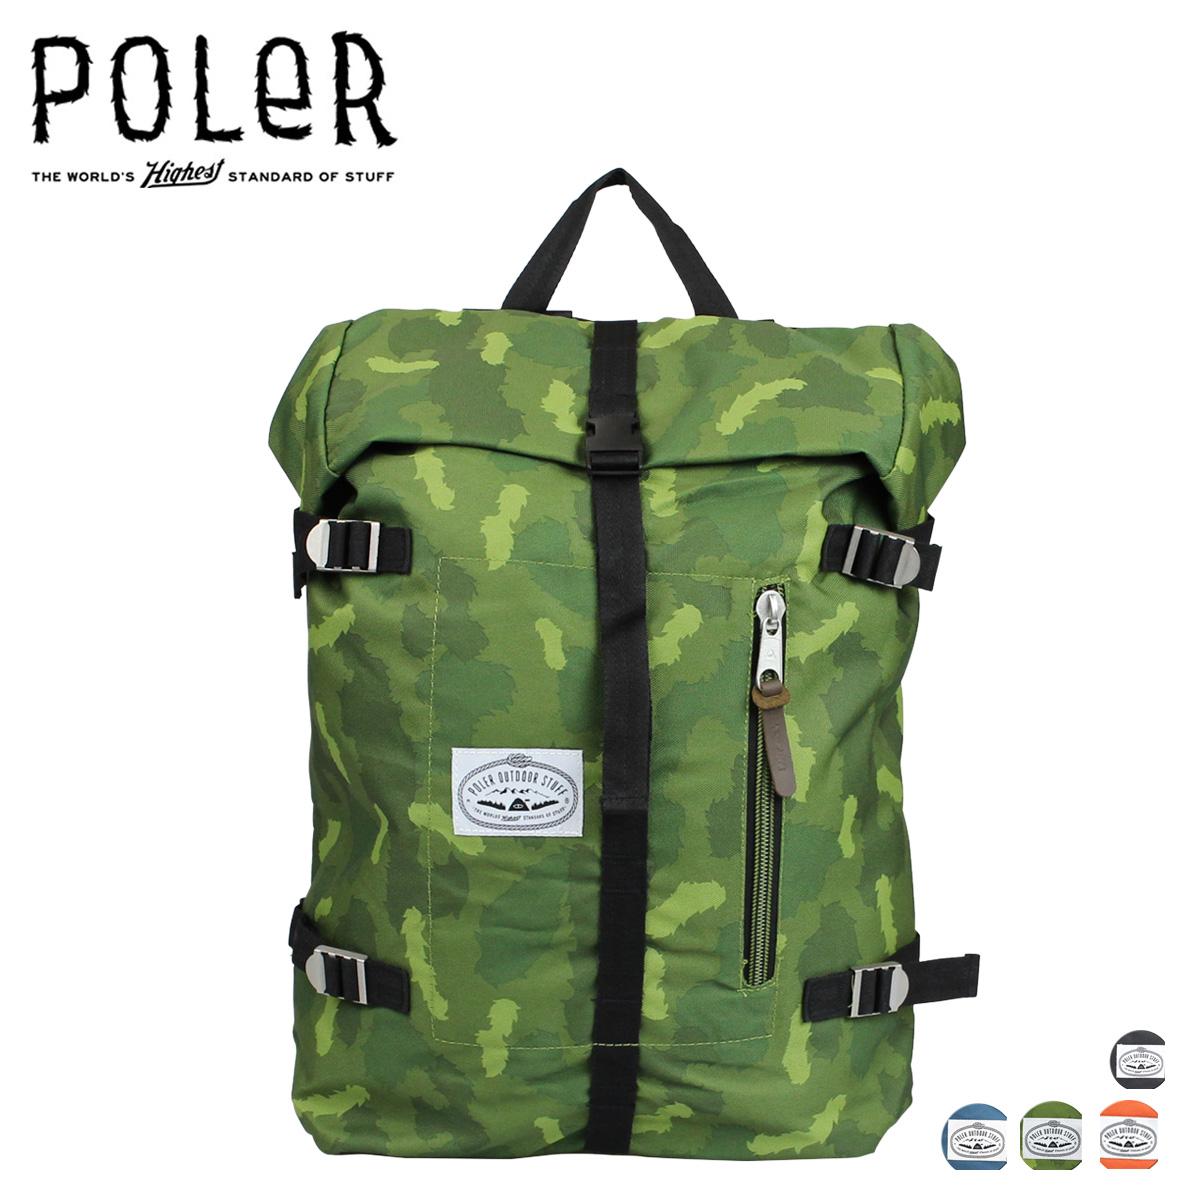 POLER ポーラー リュック バックパック 532021 メンズ レディース 【決算セール 返品不可】